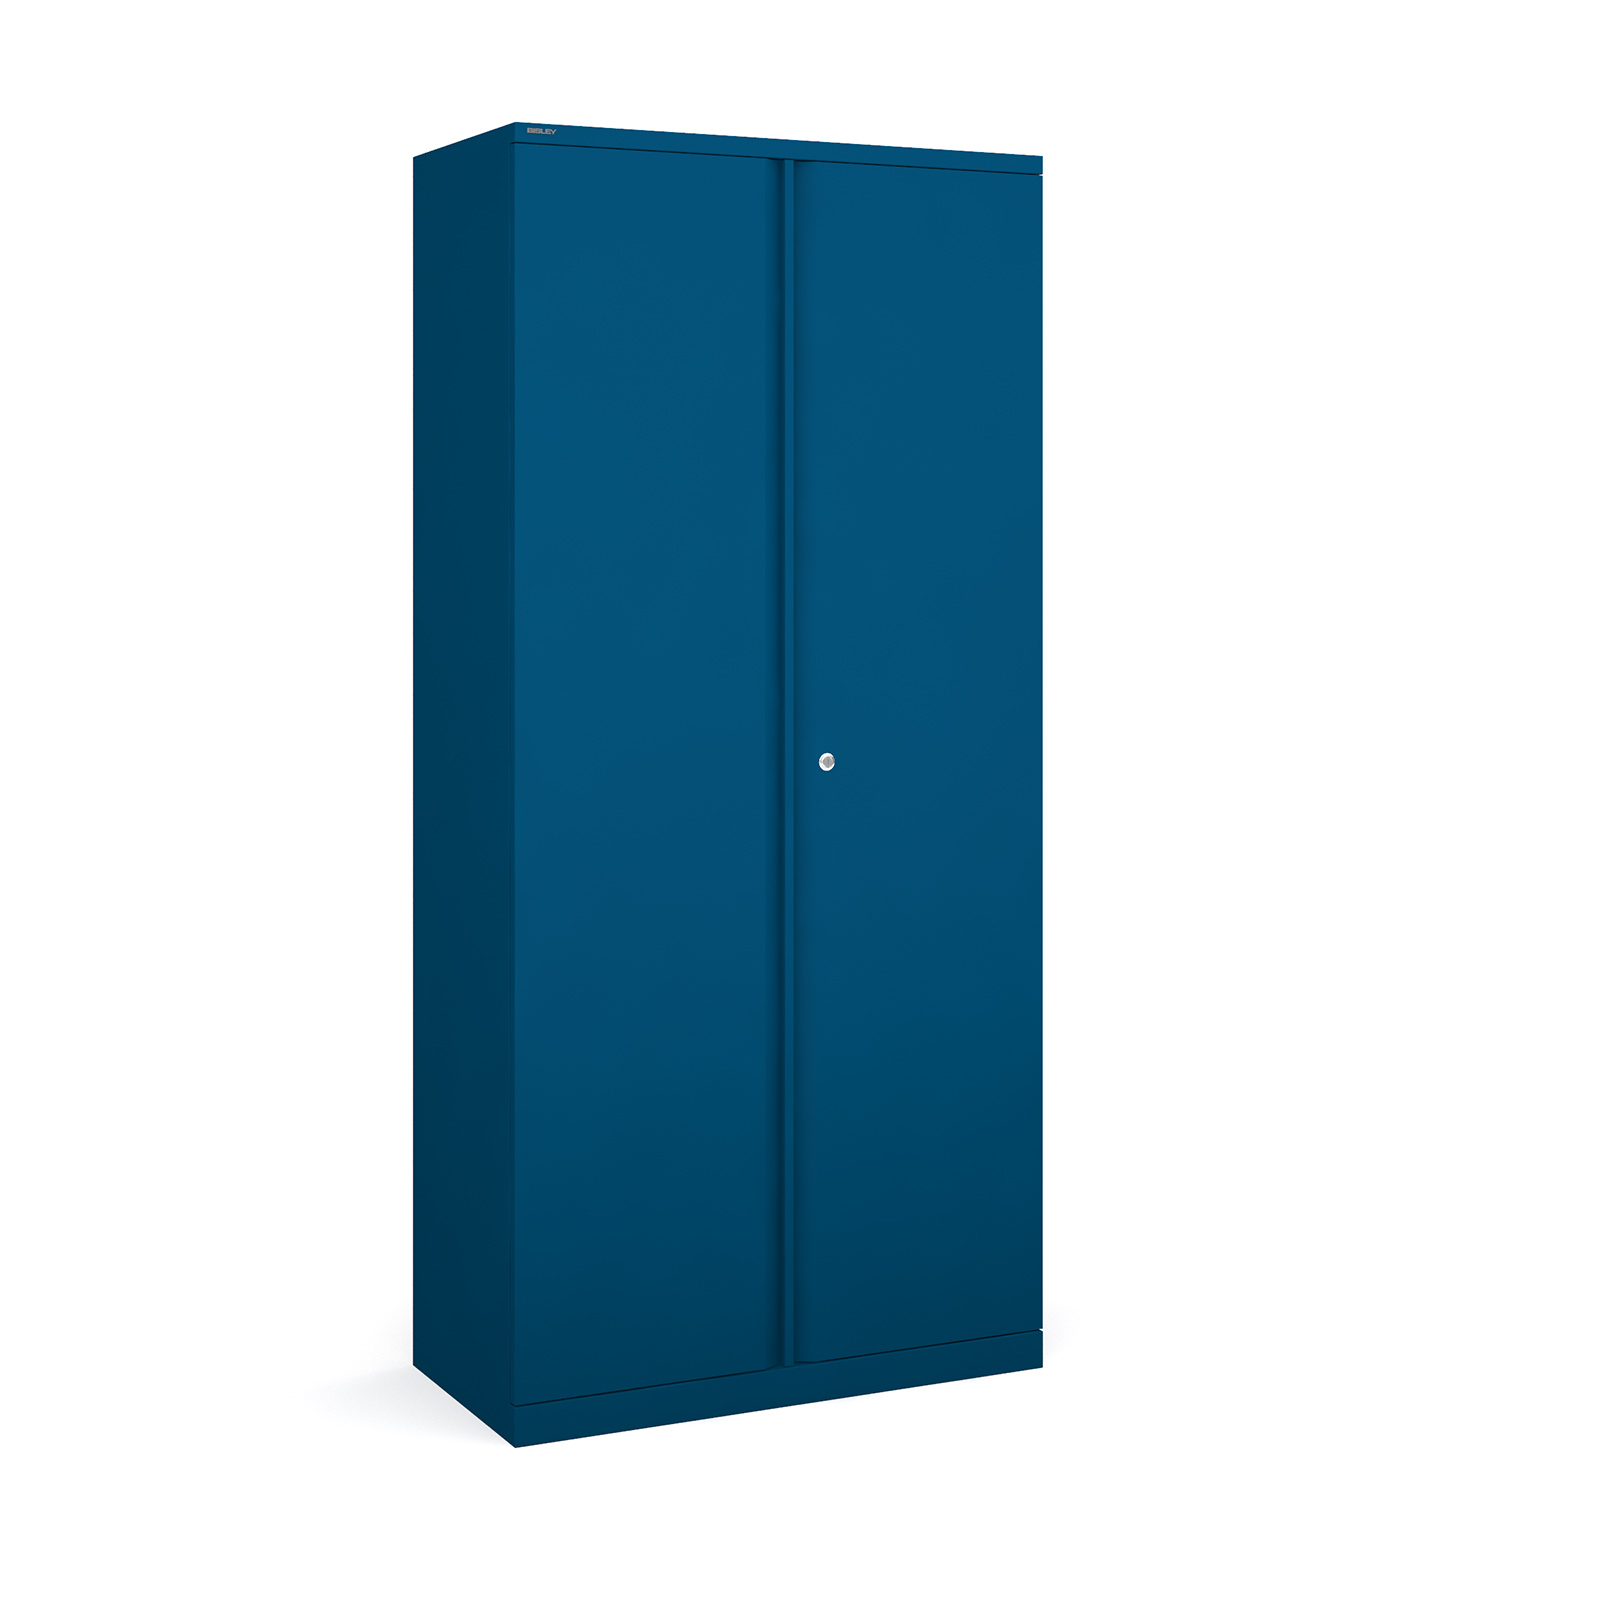 Bisley systems storage high cupboard 1970mm high - blue